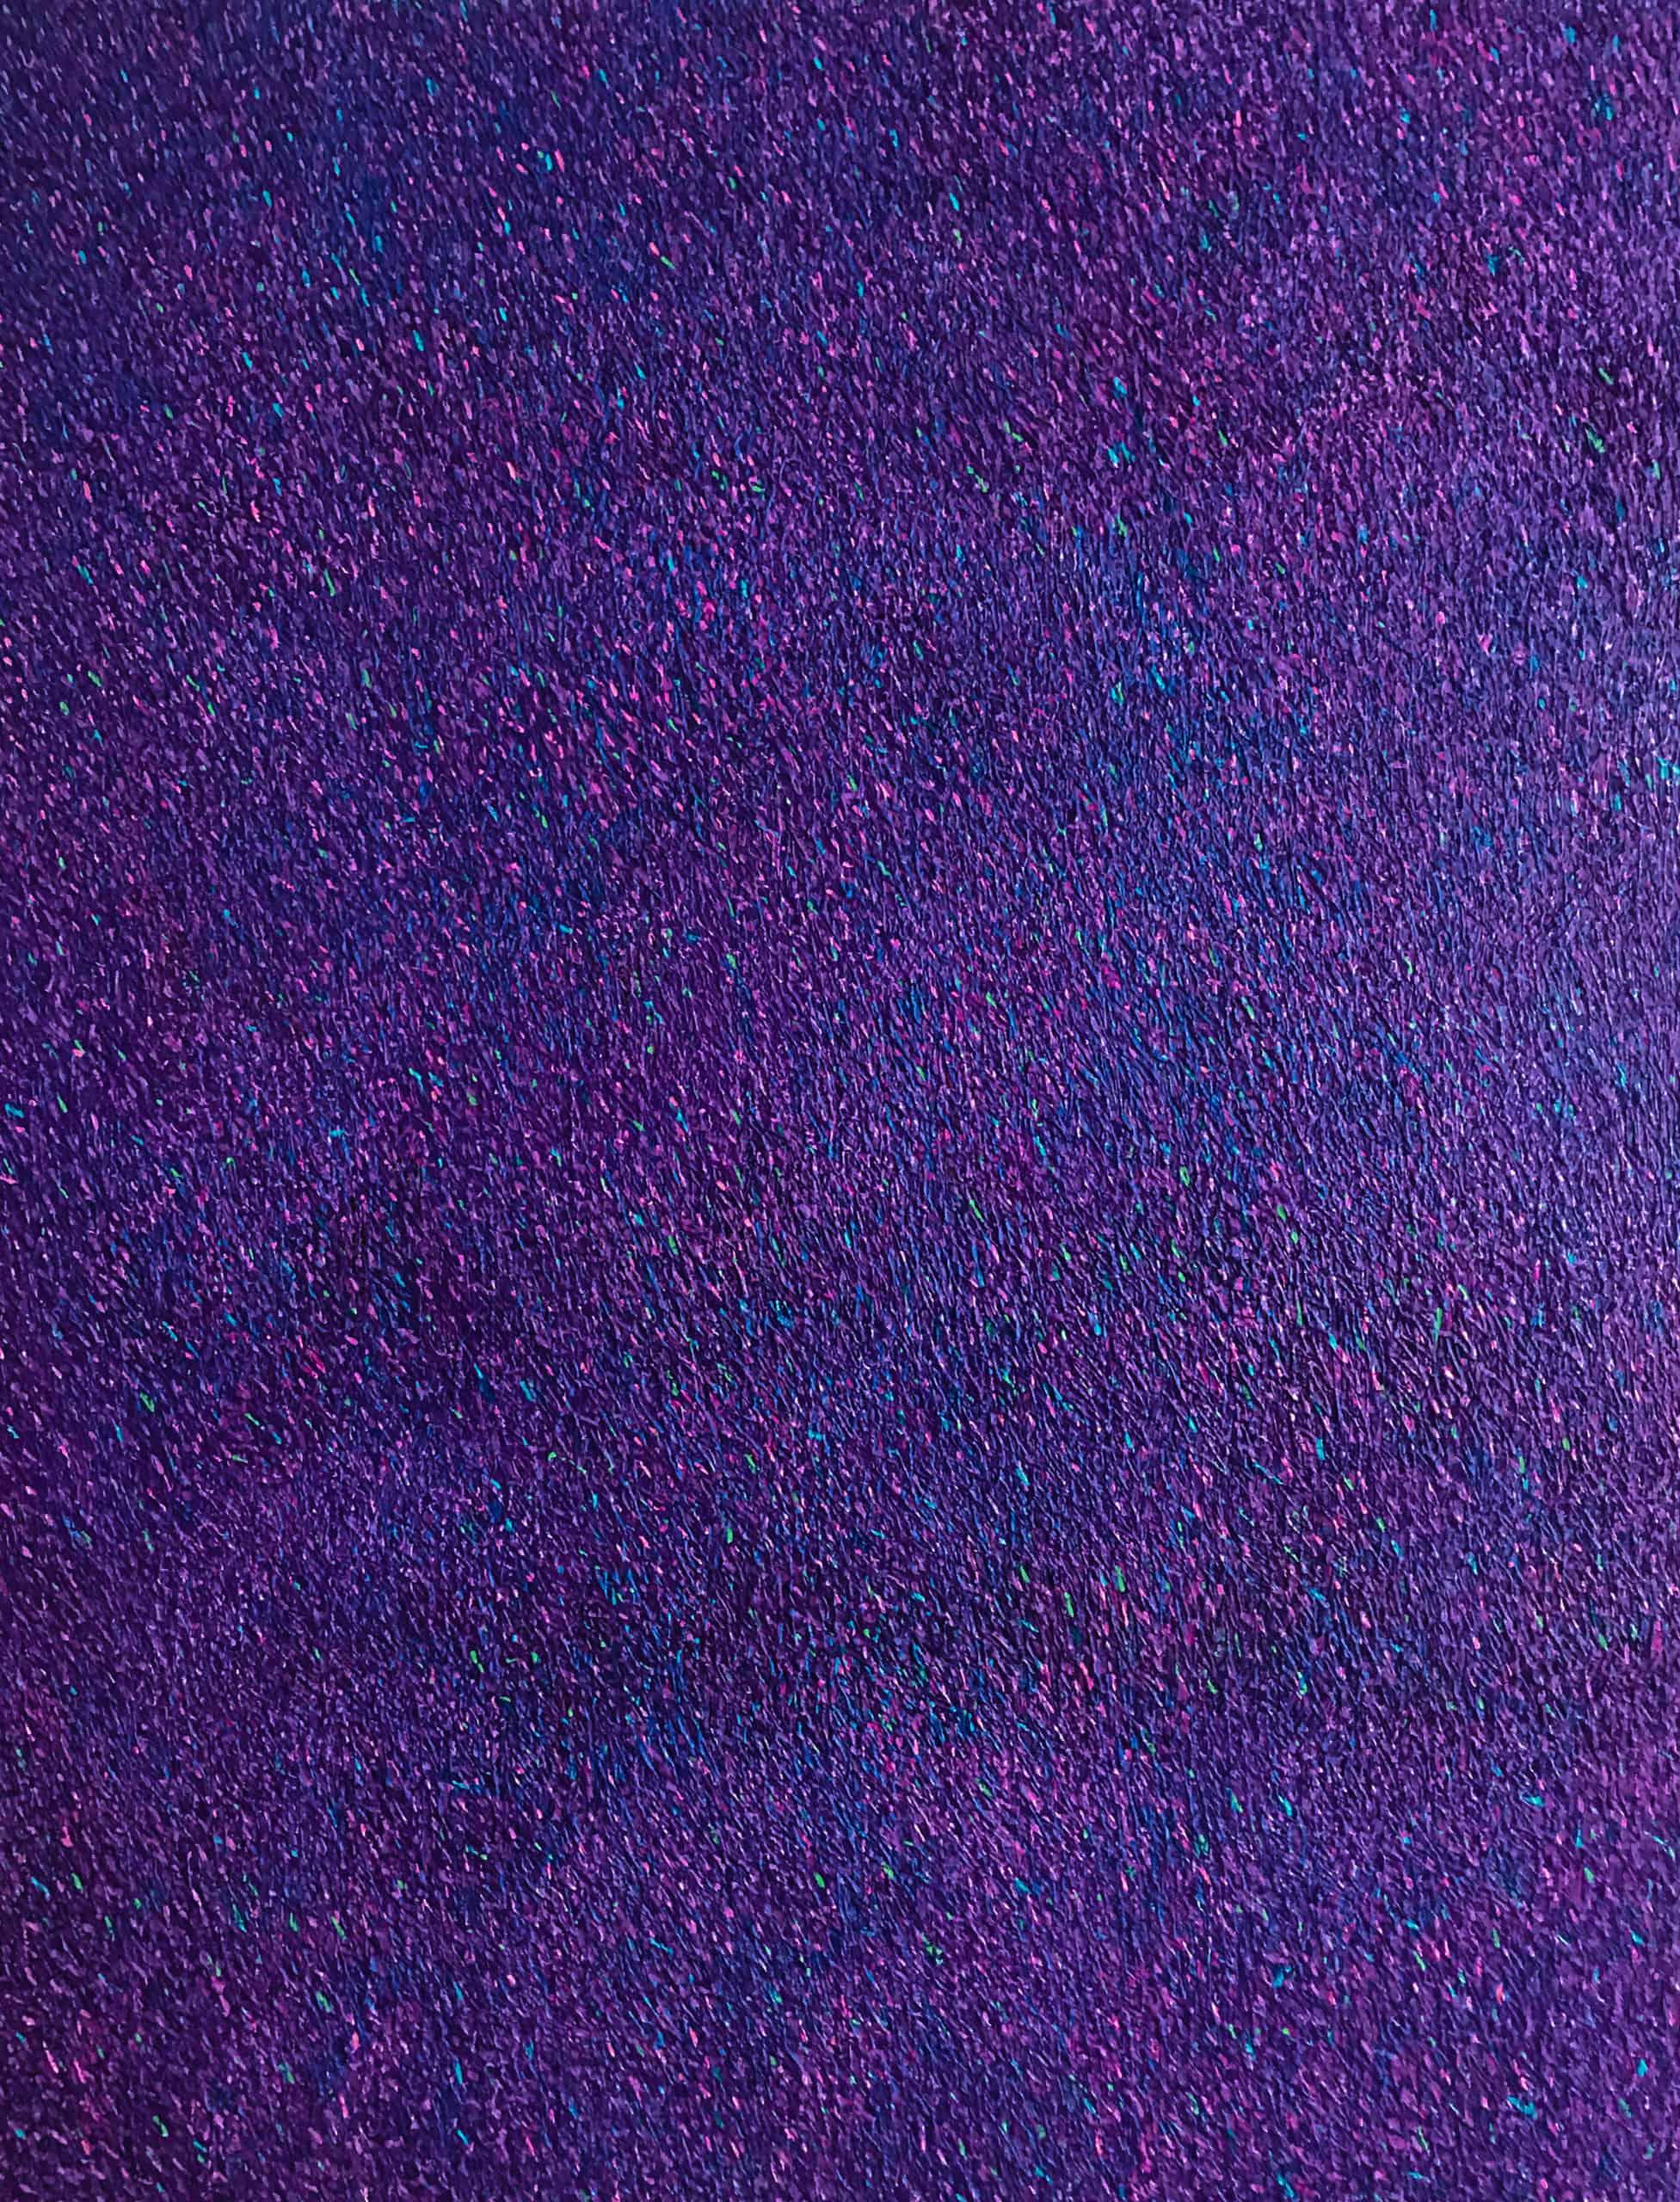 f7-2017-21_sold_Purple-1_180x140cm_Acrylic-on-linen